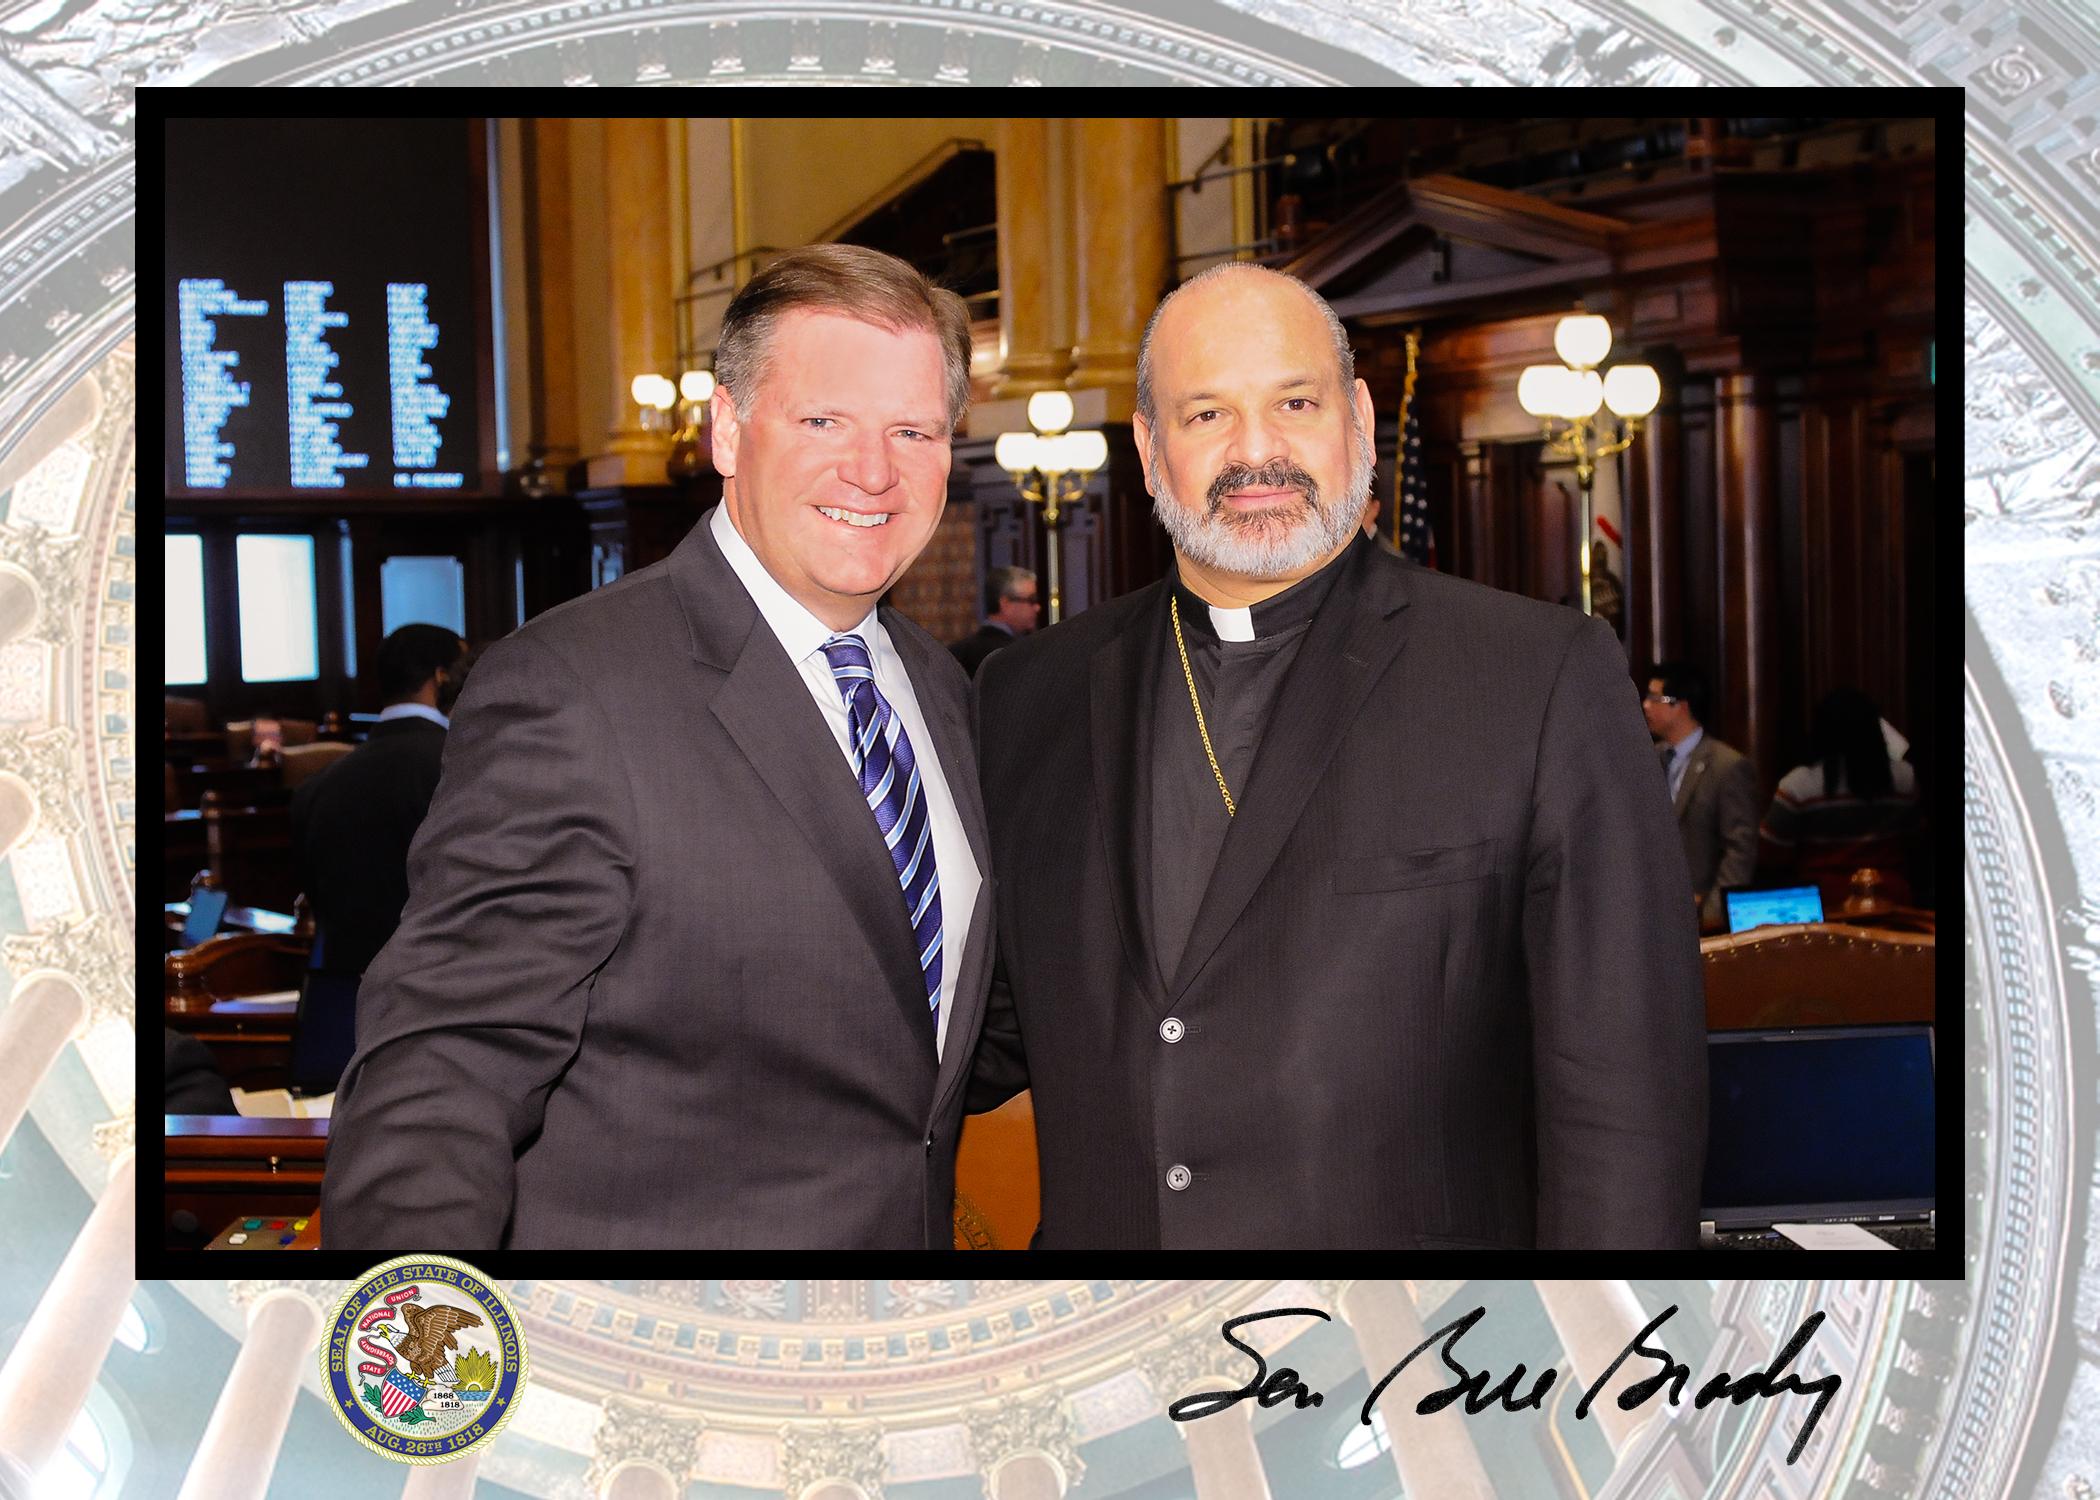 His Grace with Illinois State Senator Bill Brady